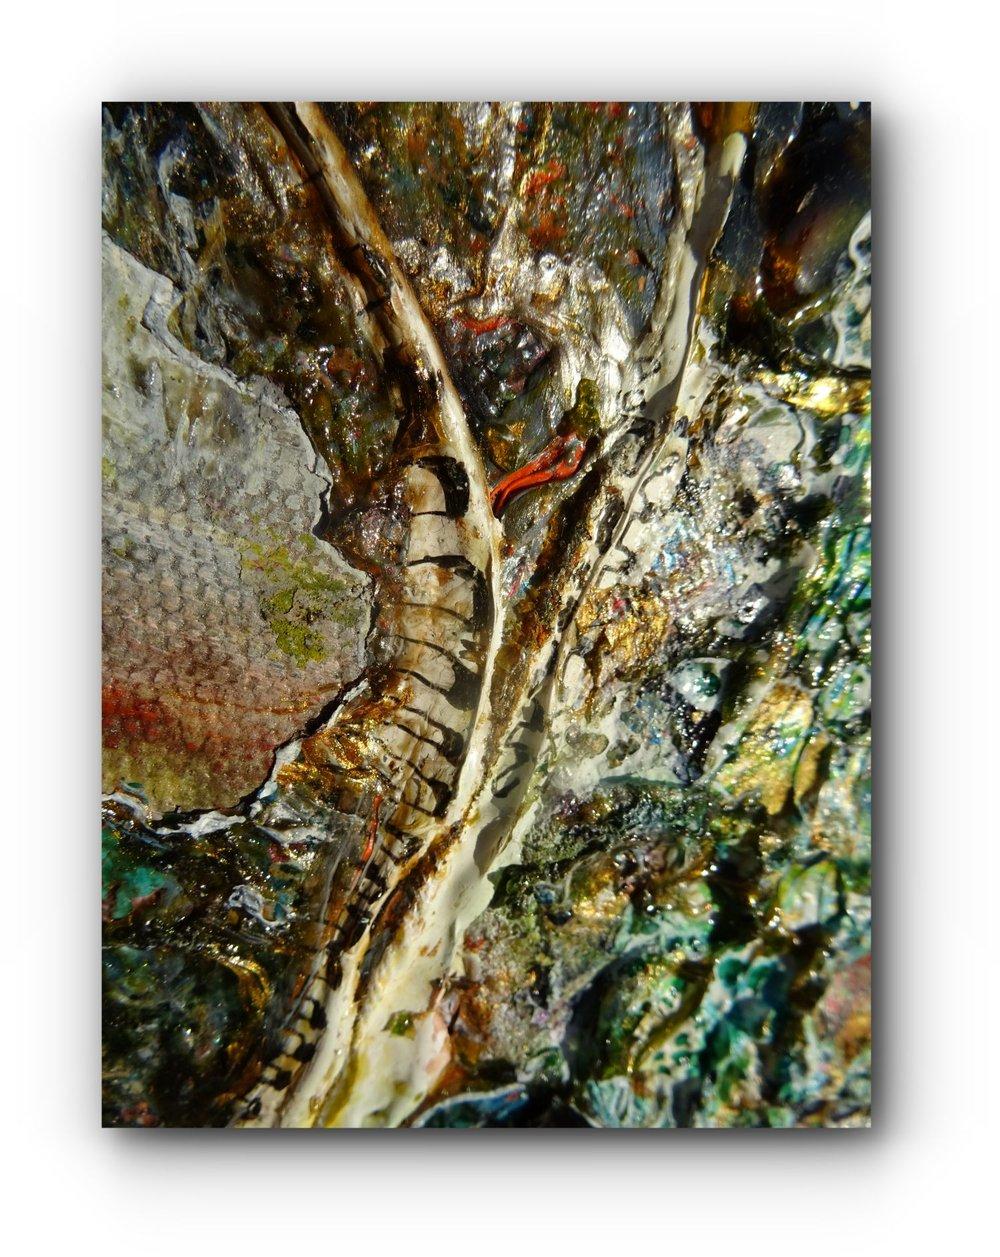 painting-detail-5-birds-eye-view-ingress-vortices.jpg